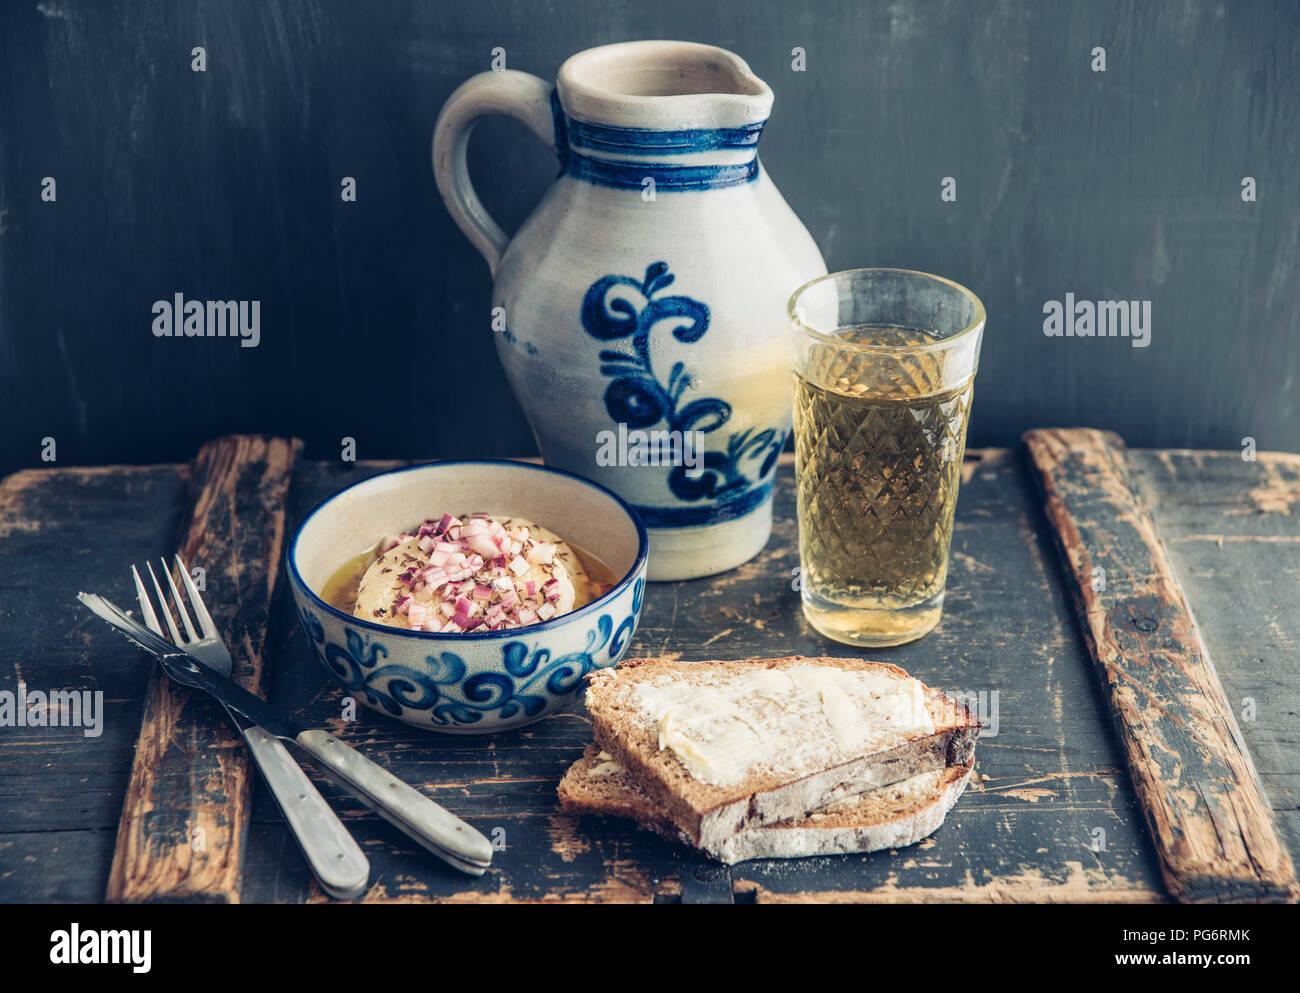 Hessian (Frankfurter) Apfelwein with Bembel - Stock Image